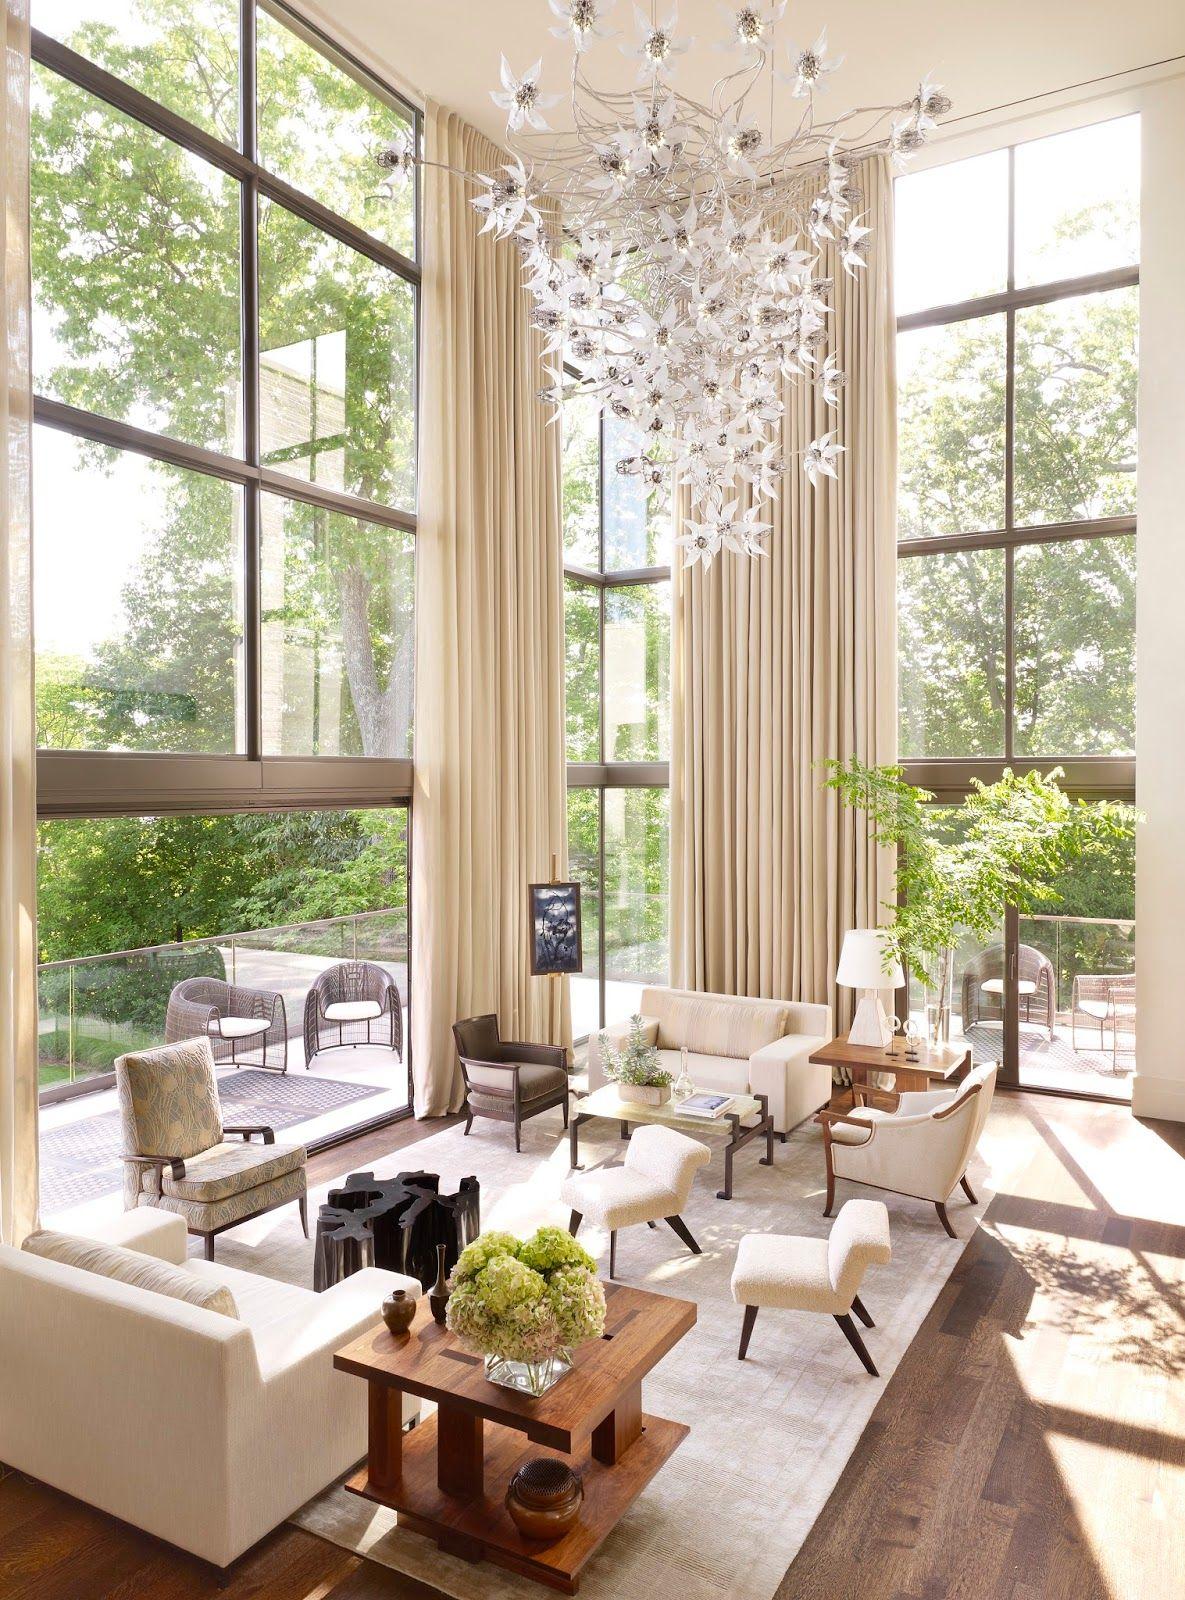 Window Inspiration Window Ideas Window Exterior Windows Repurposed Windows In Kitchen Windows In Living Rooms House Design Home Decor Living Decor #window #design #for #living #room